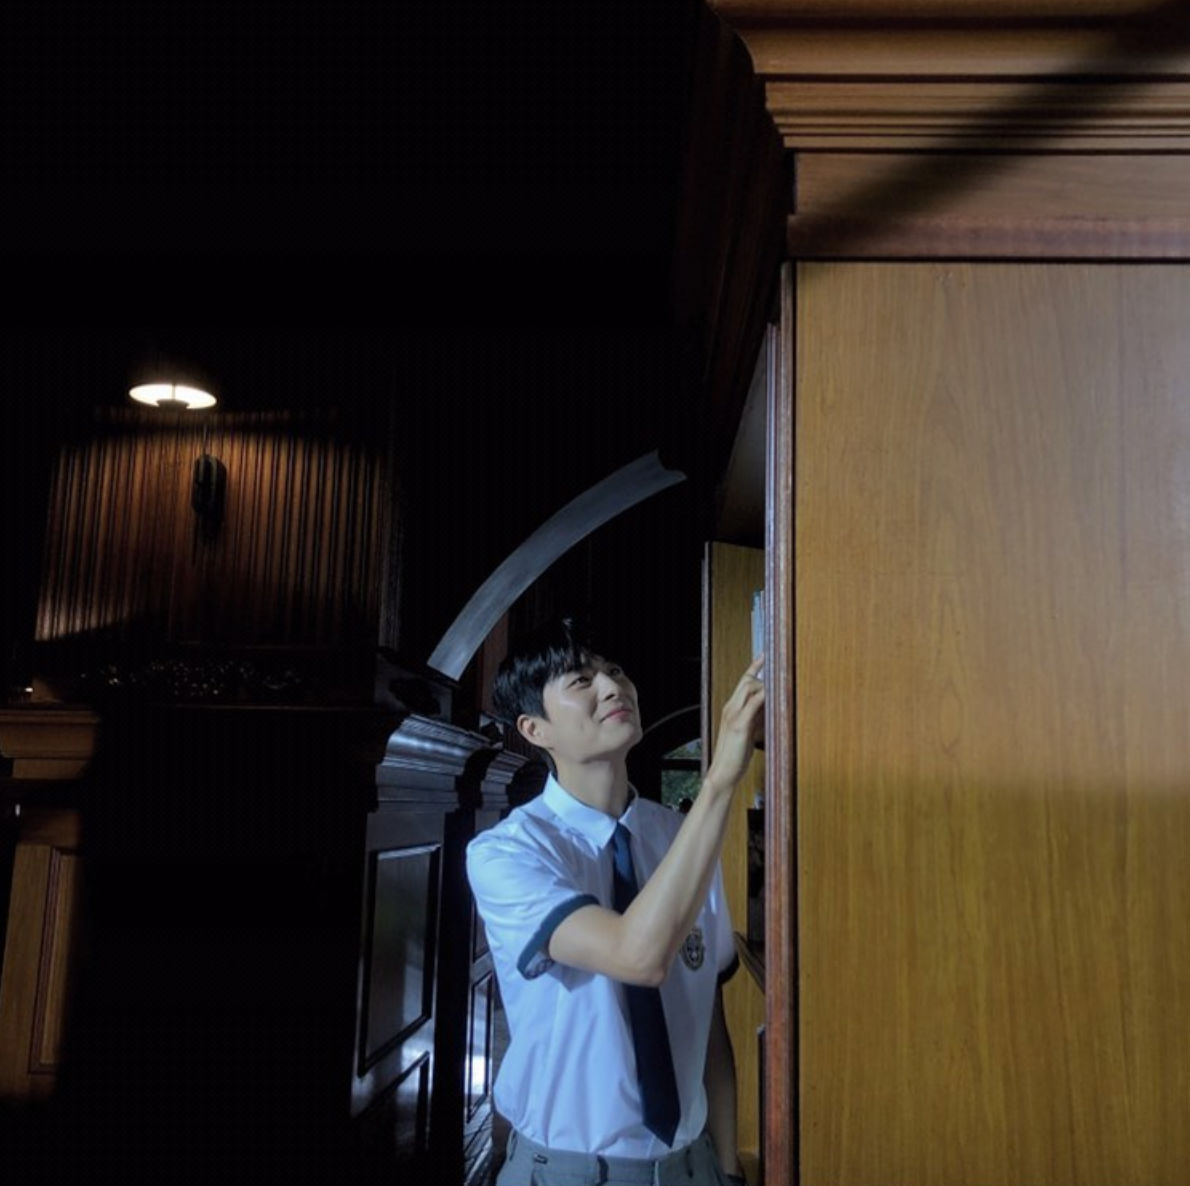 Jung Gun-joo behind the scenes in Extraordinary You